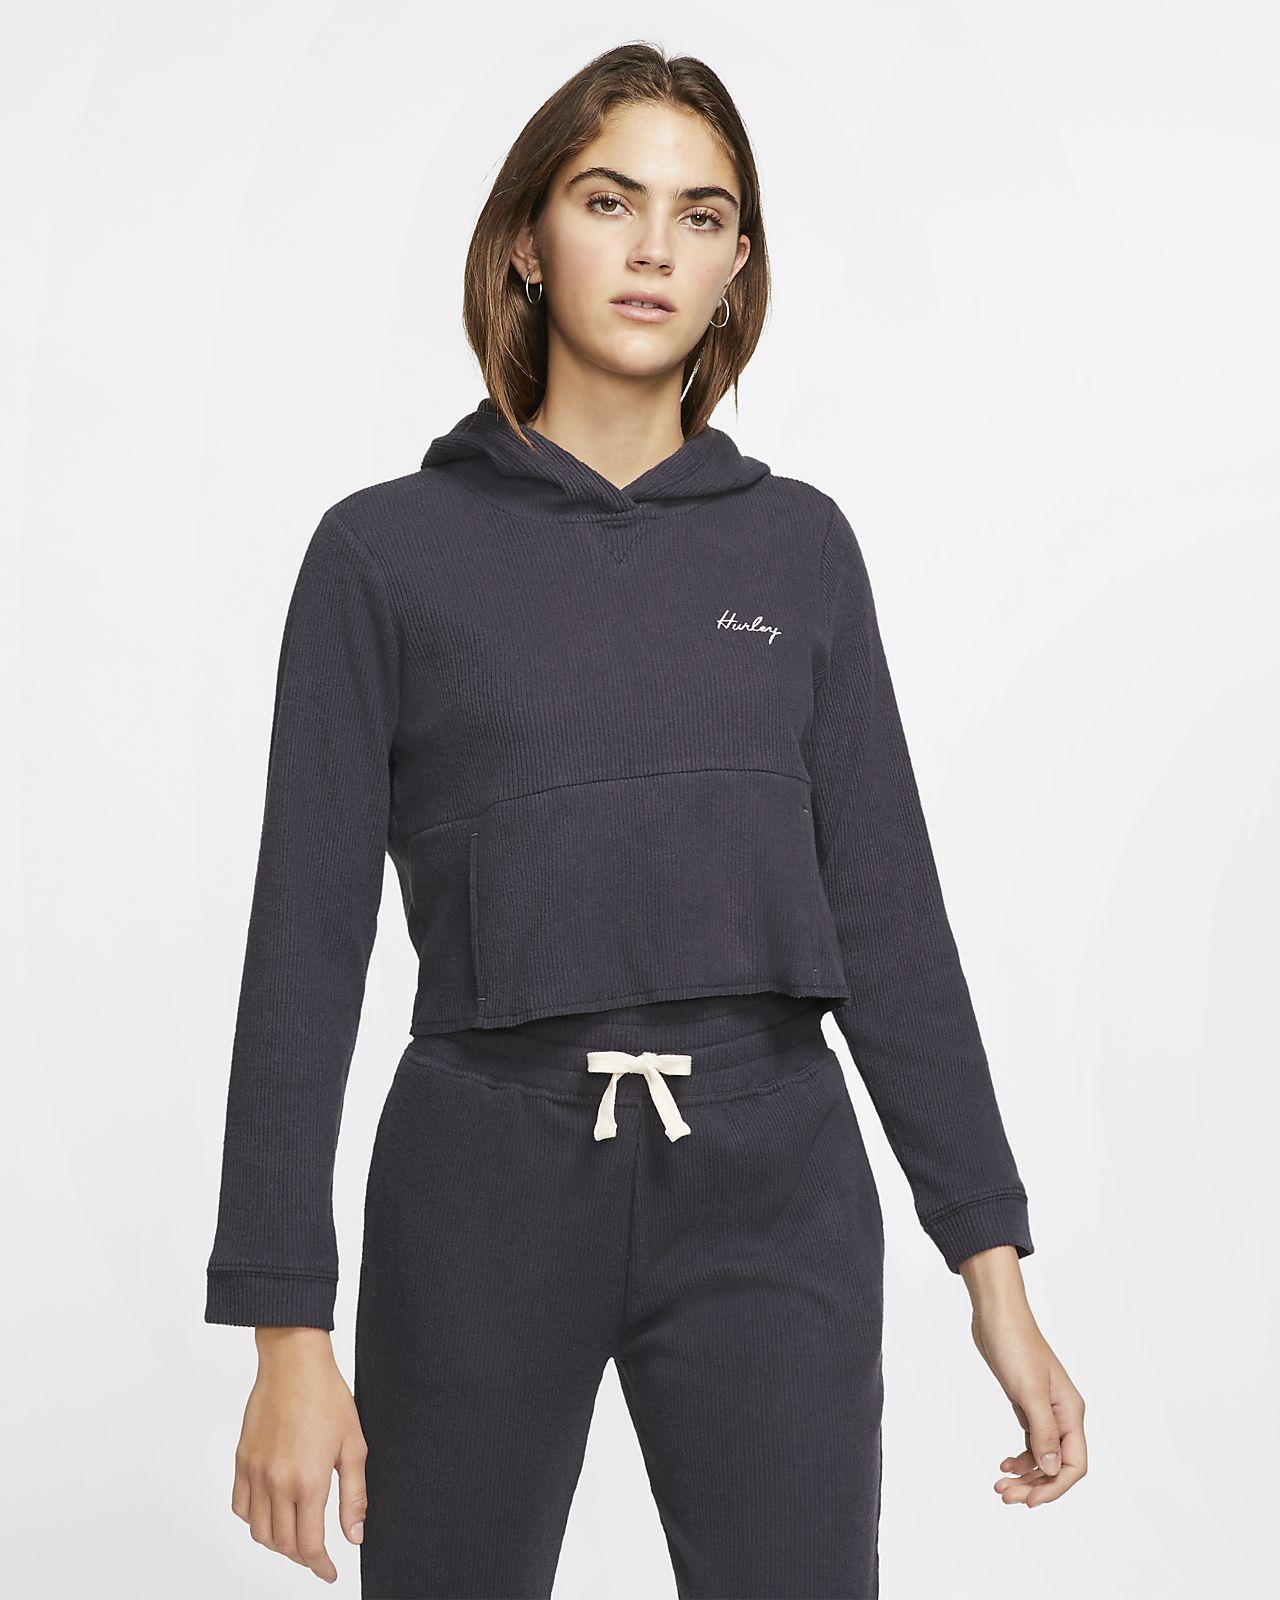 Hurley Chill Rib Women's Cropped Fleece Sweatshirt